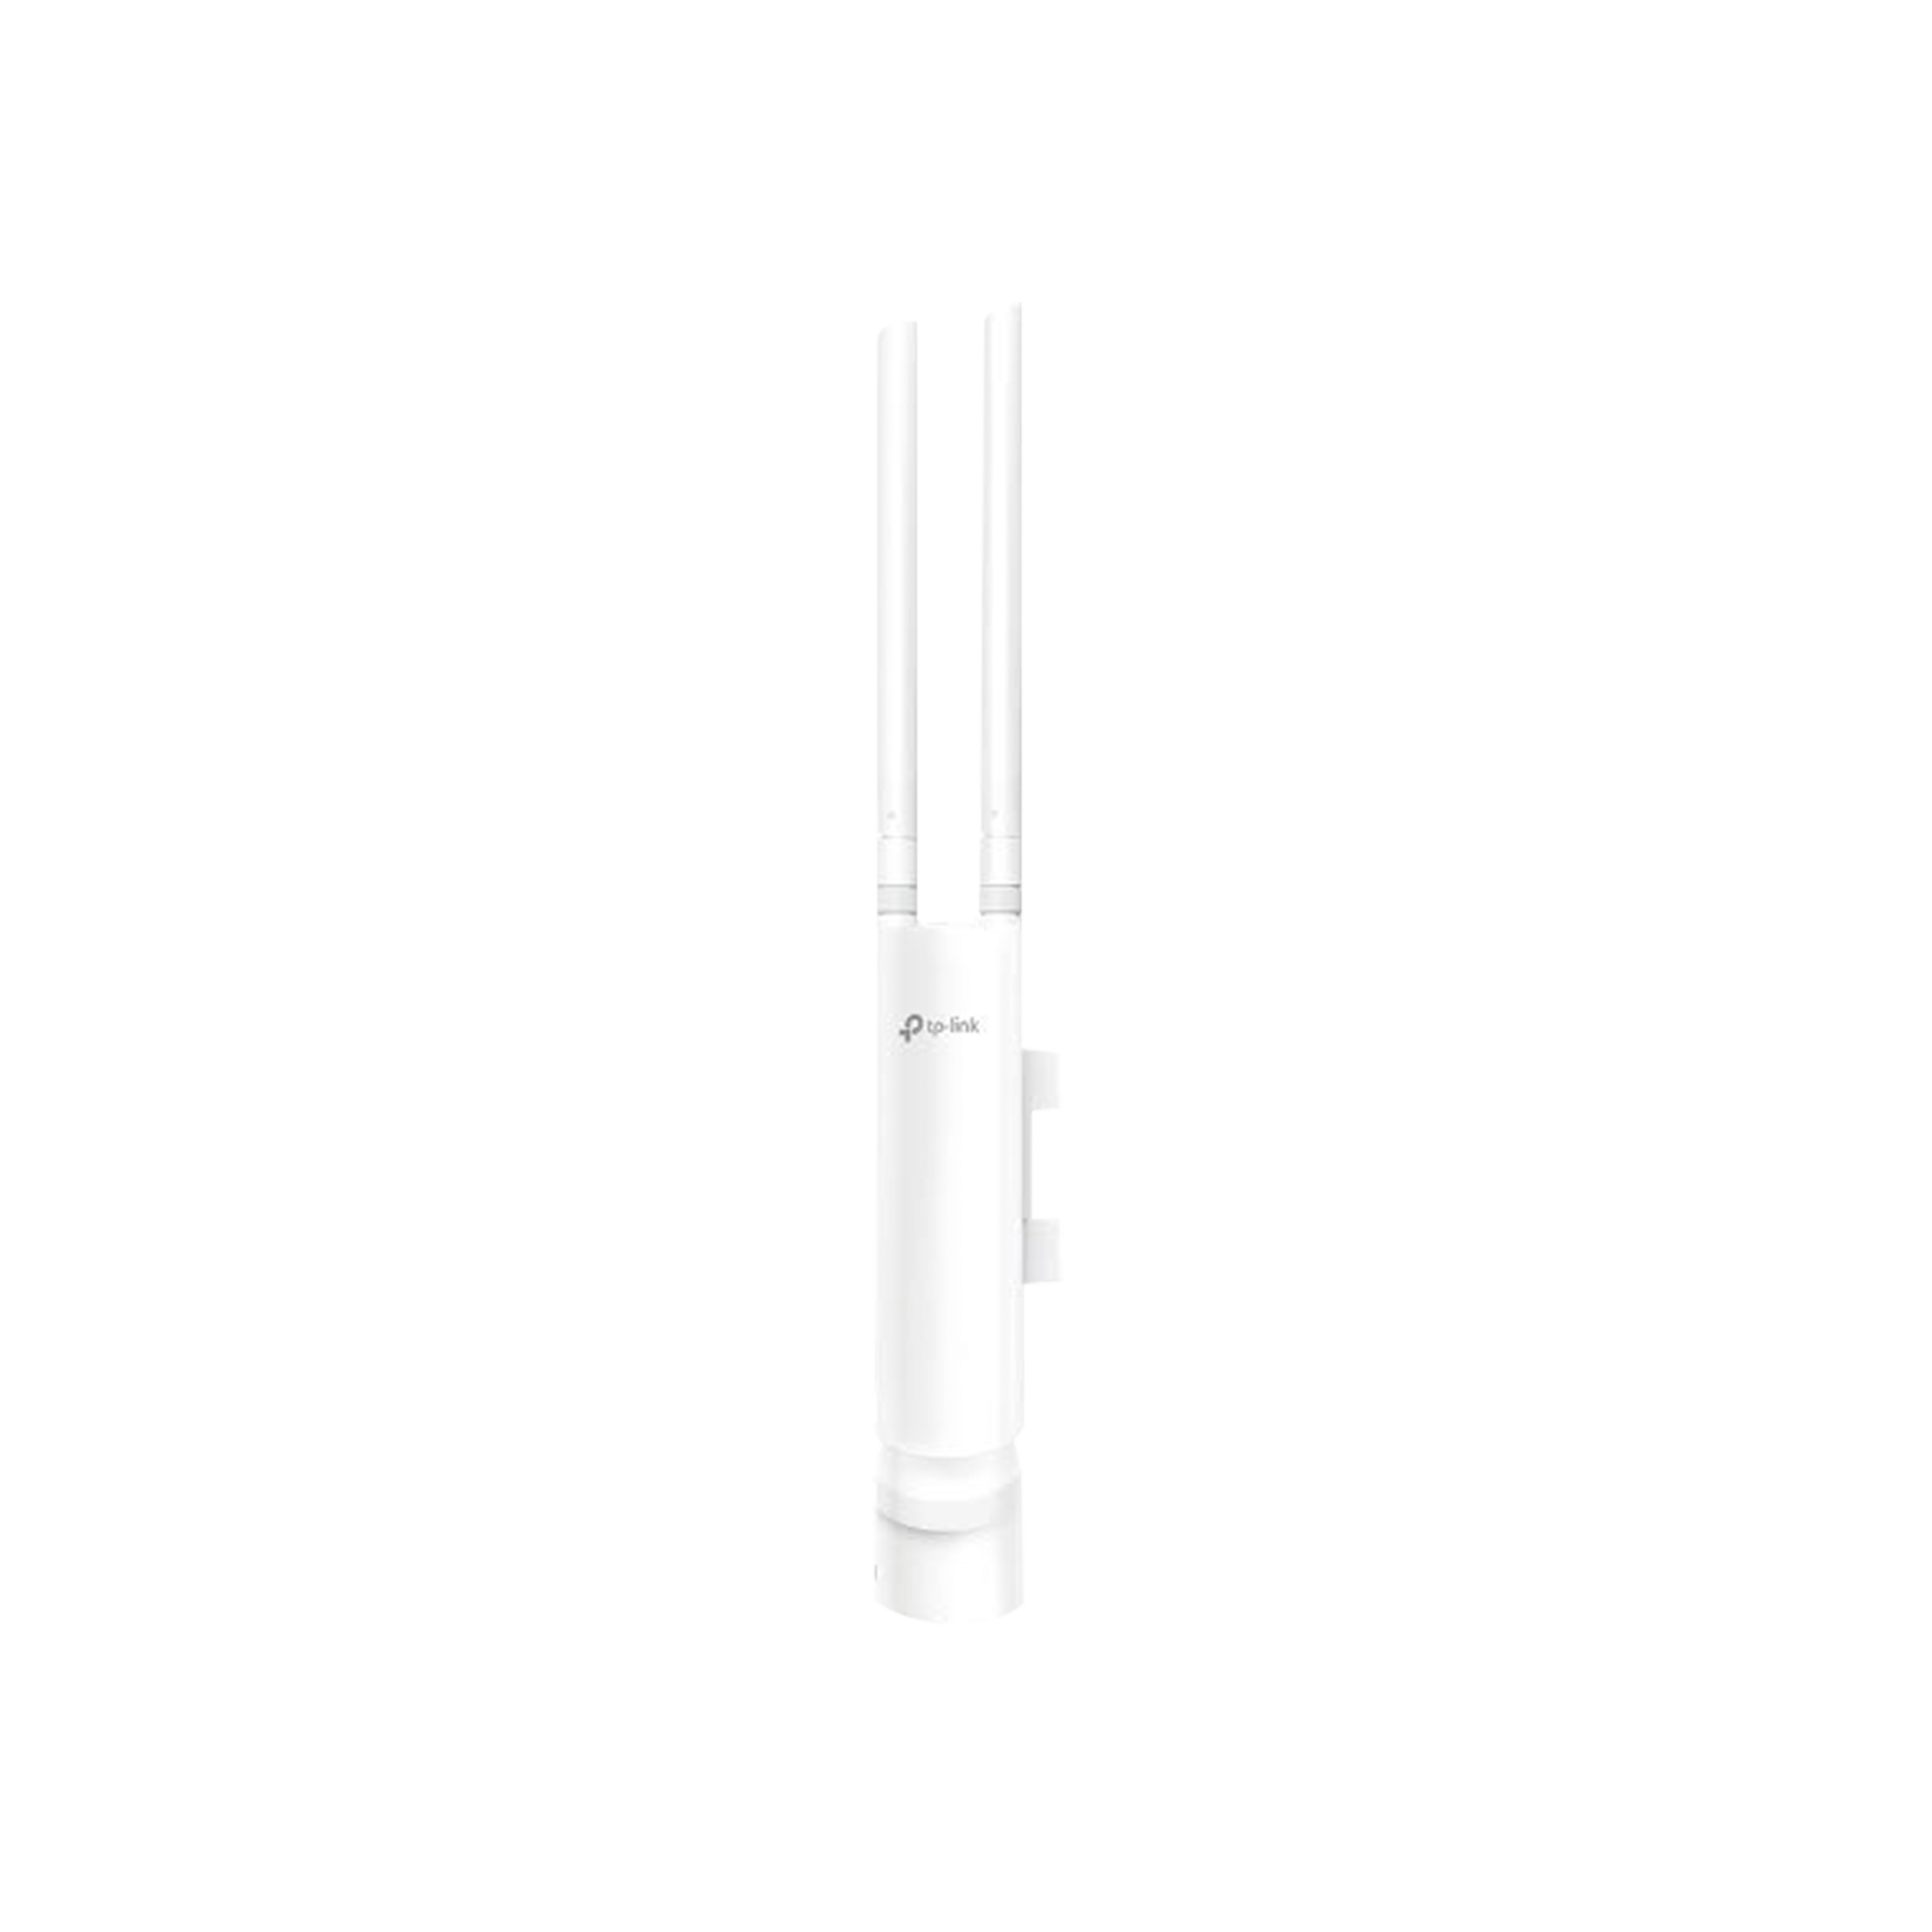 Punto de acceso WiFi Omada para exterior, 802.11 b/g/n (2.4 GHz), 2 antenas de 3 dBi desmontables, alimentación PoE pasivo, soporta hasta 50 clientes.